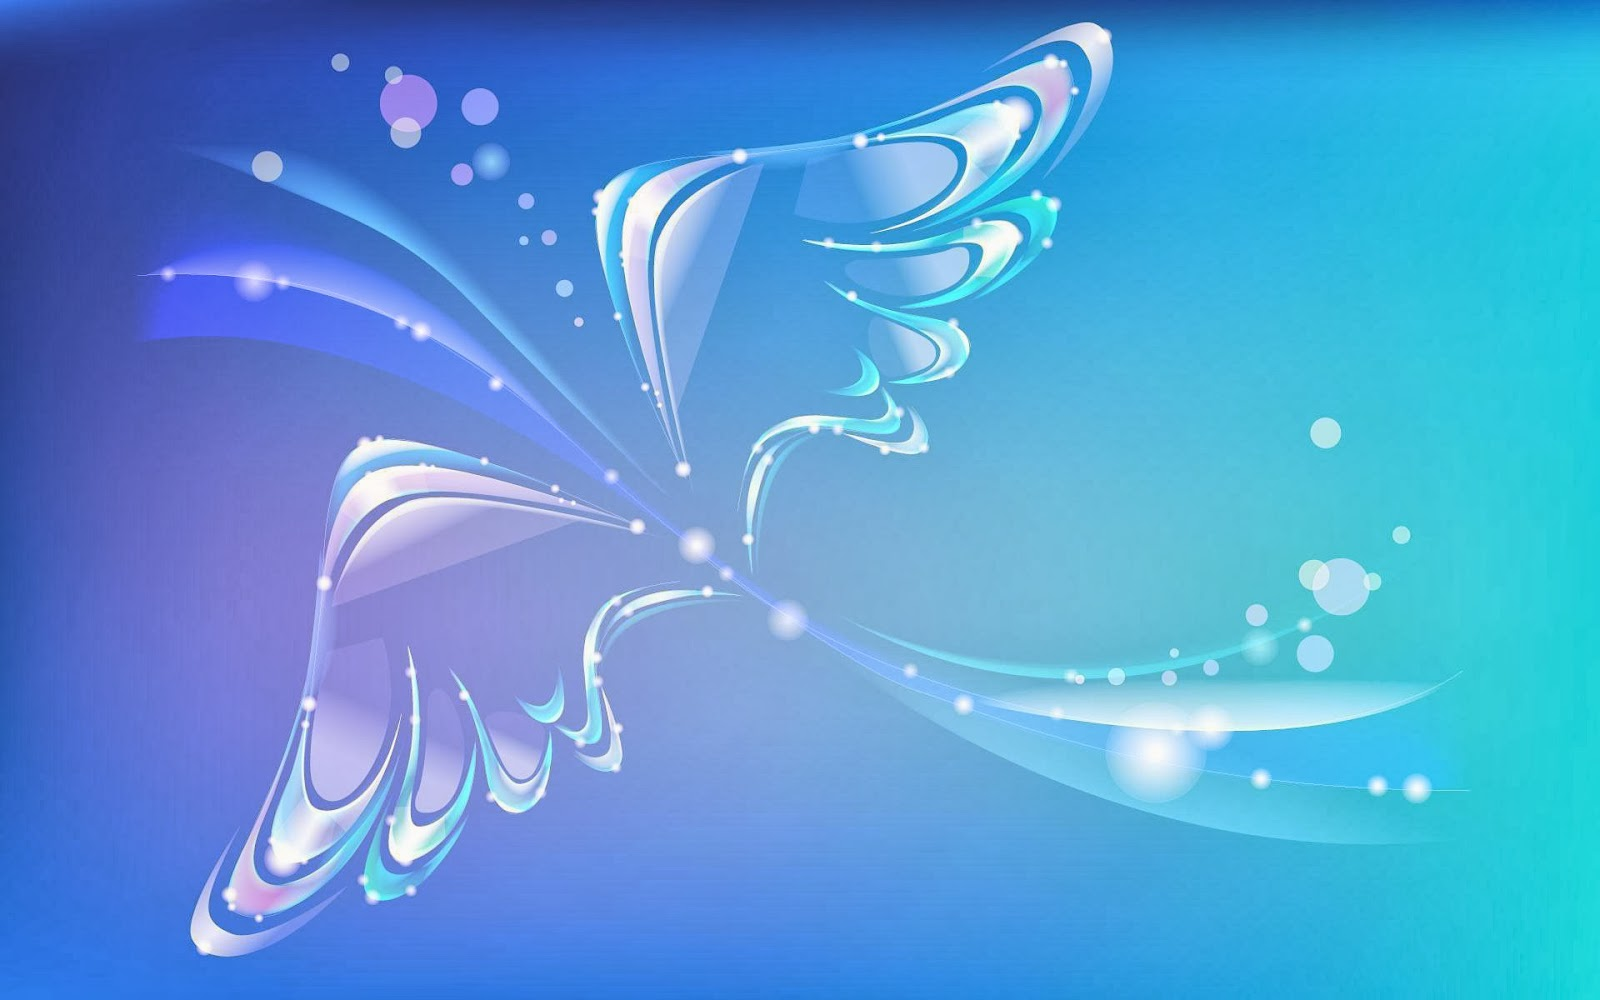 butterfly 3d desktop wallpapers   beautiful desktop wallpapers 1600x1000